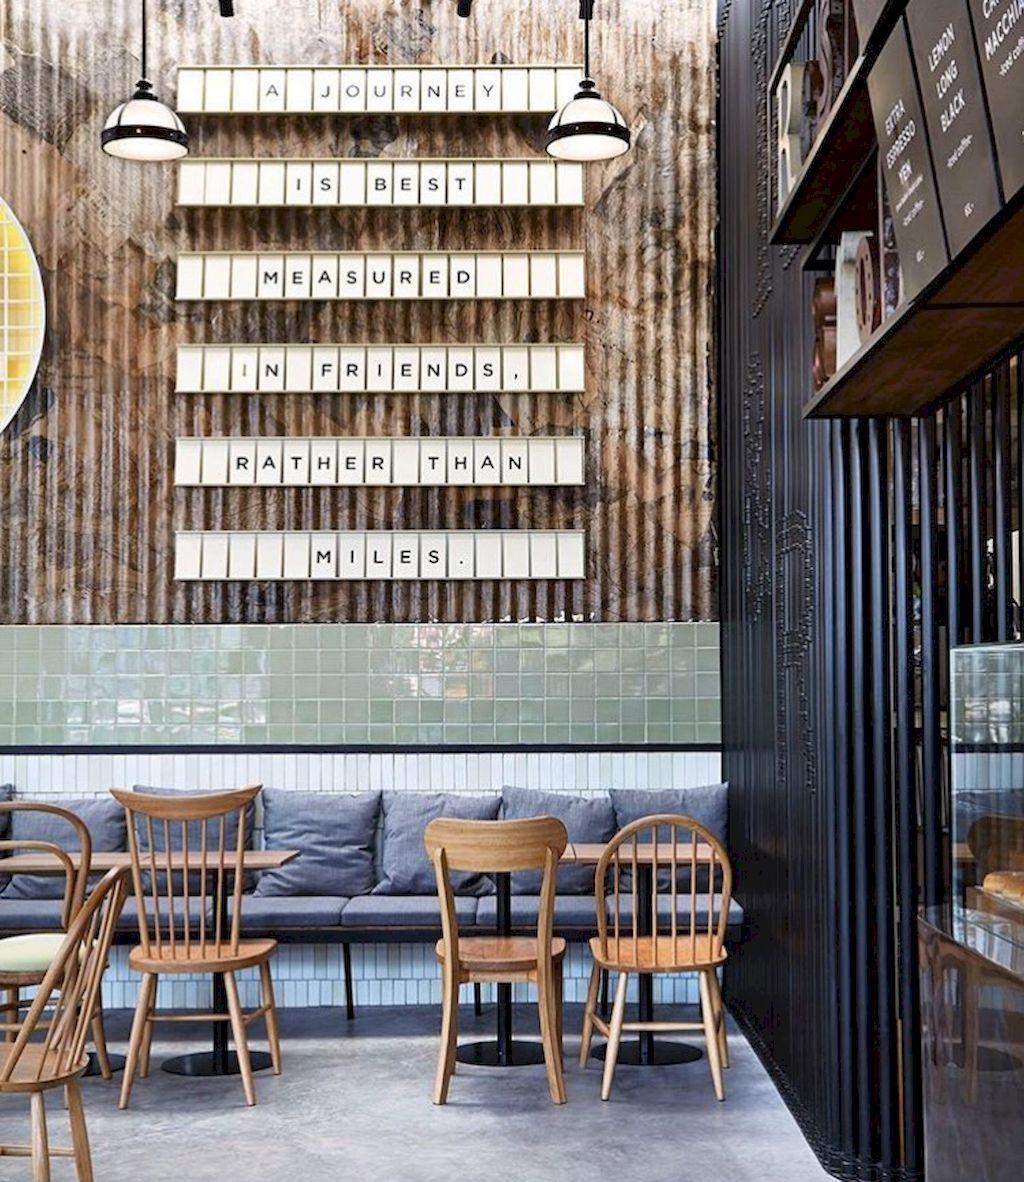 Homedesignideas Eu: It's Time To Upgadre Your Modern Bar Decor